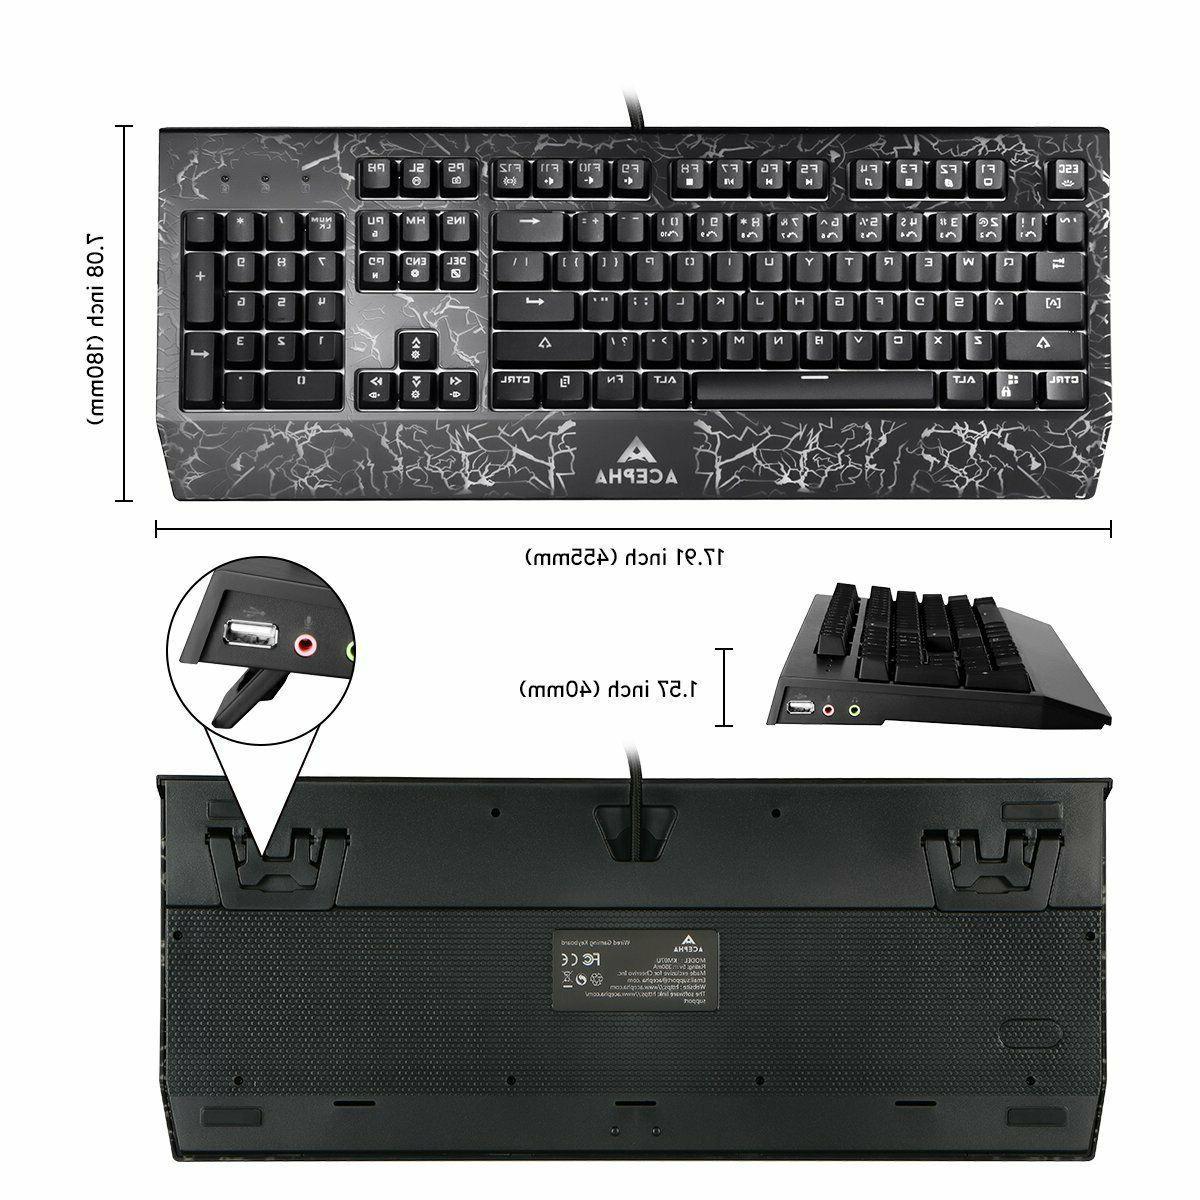 NPET K10 Gaming USB Wired Keyboard, Quiet Ergonomic